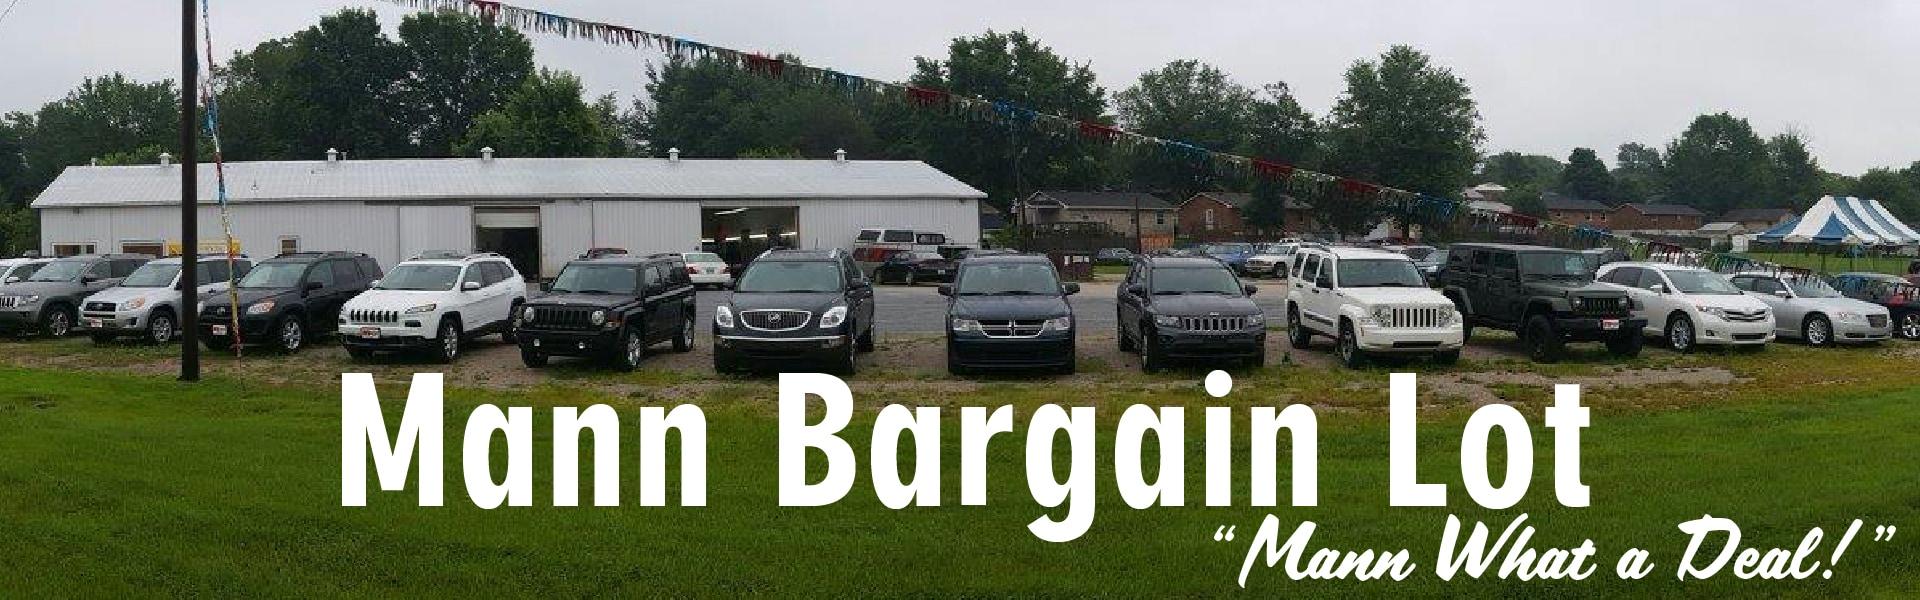 Mann Bargain Lot Mann Chrysler Dodge Jeep Ram Of Mt Sterling